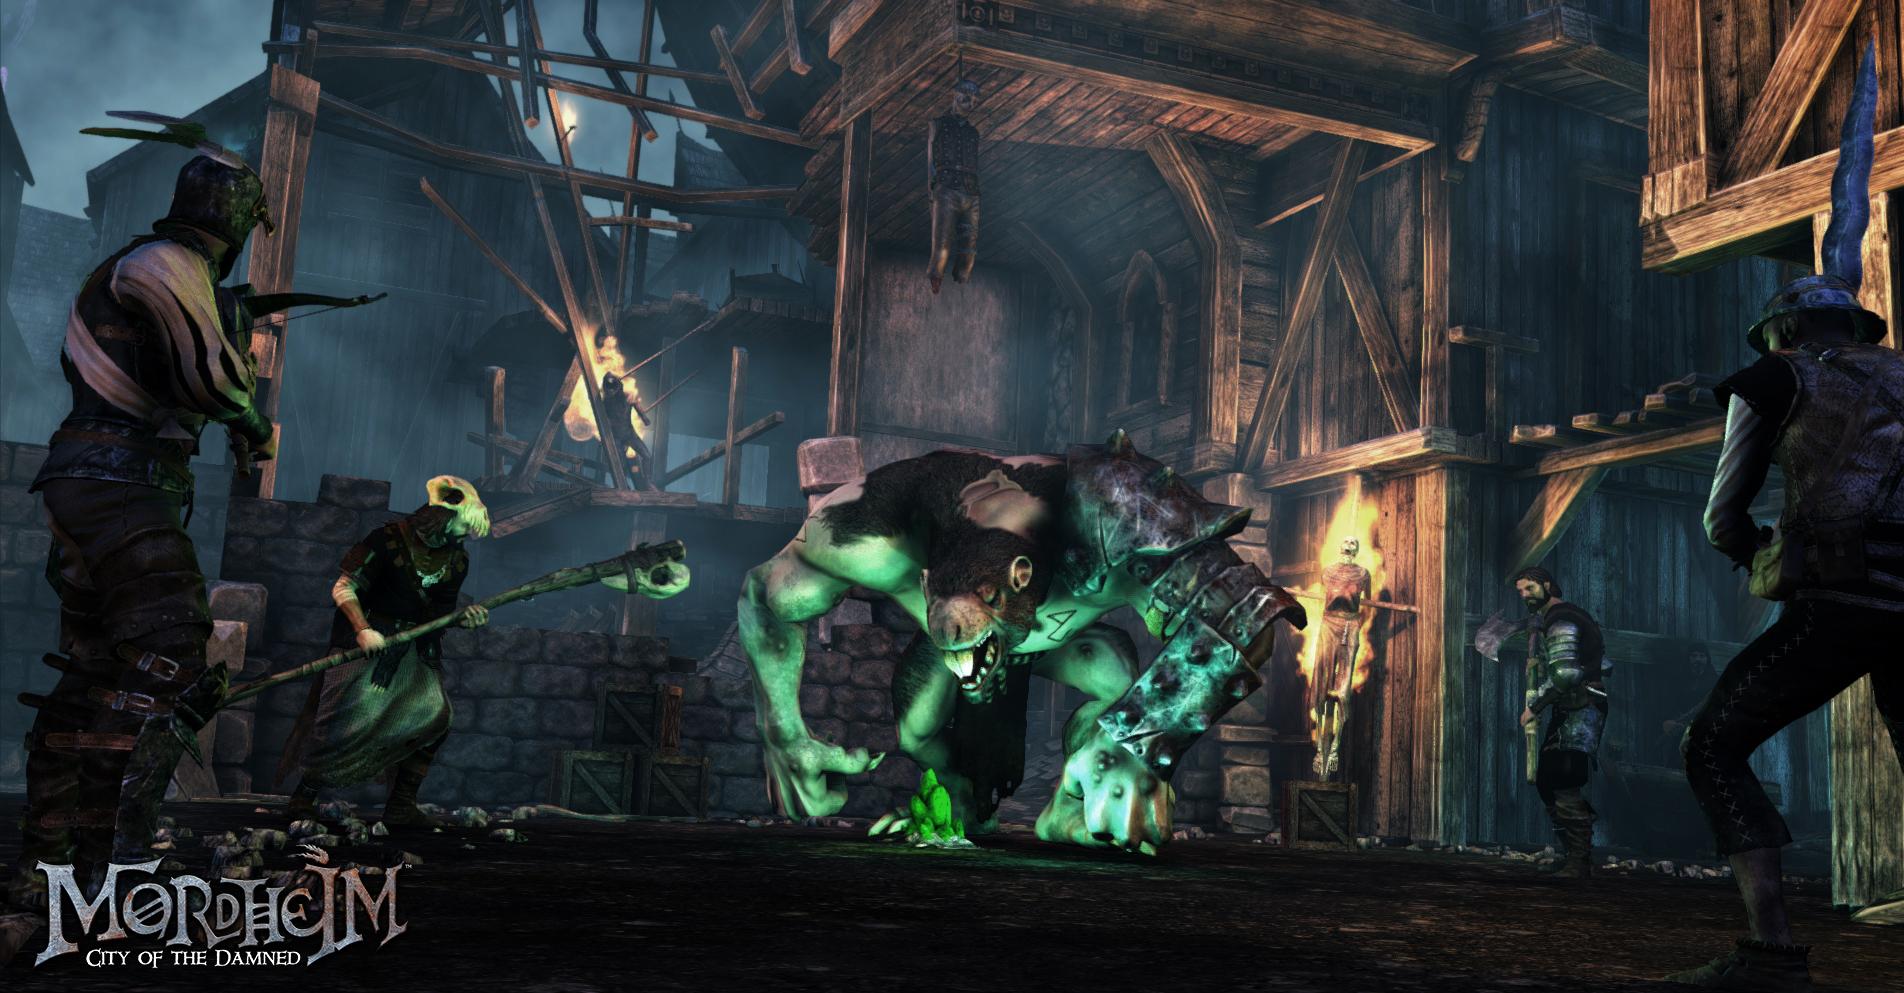 [Jeu vidéo] Mordheim : City of the Damned (PC) 811158Mordheim11